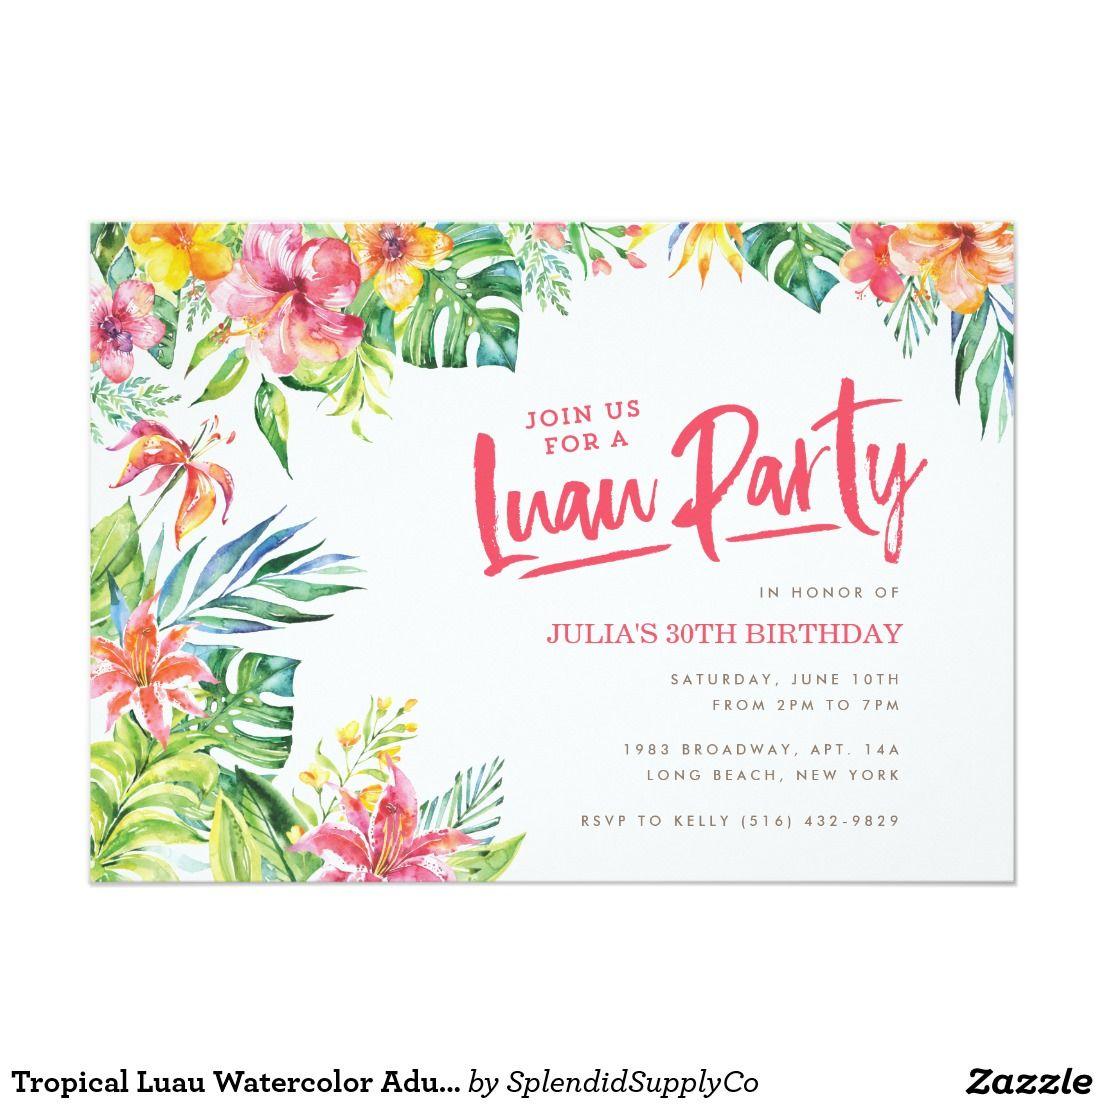 Tropical Luau Watercolor Adult Birthday Invitation | Luau Wedding ...